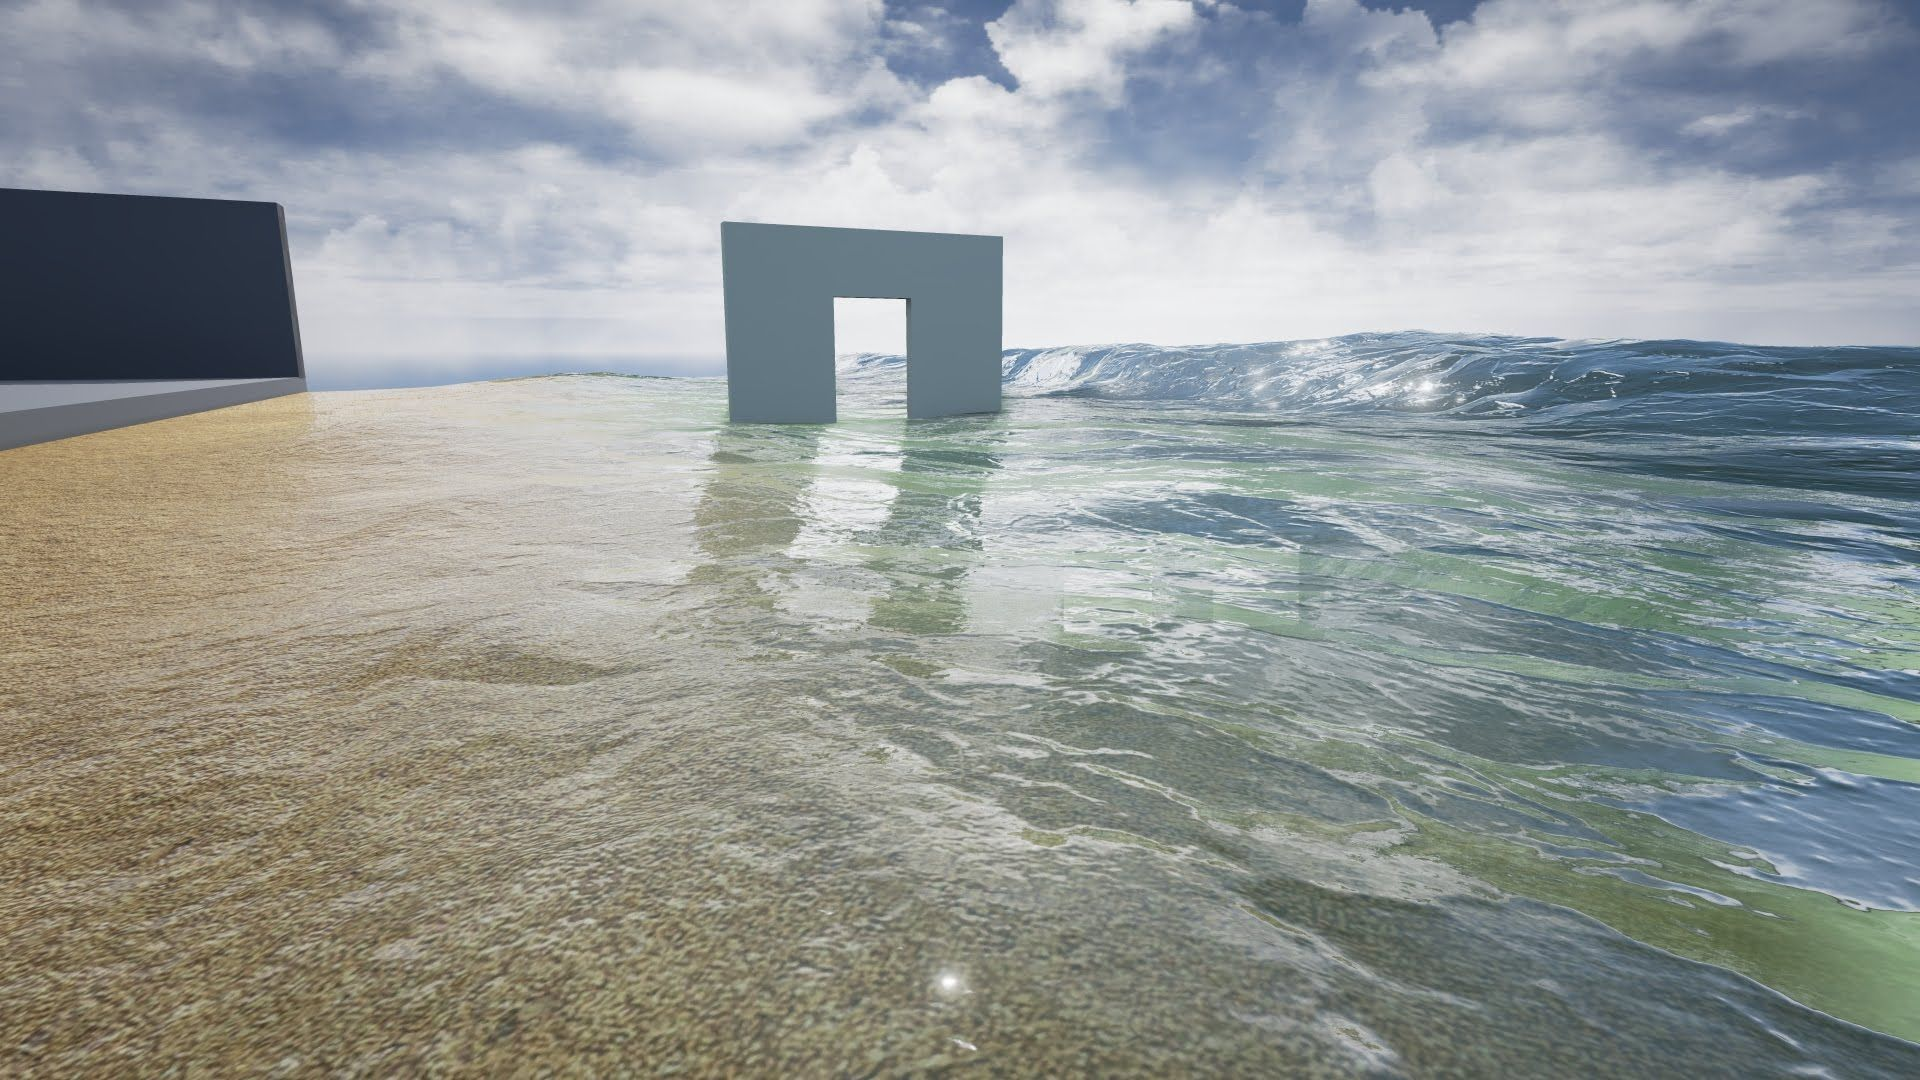 UE4 Ocean Water Shader | Unreal 4 in 2019 | Unreal engine